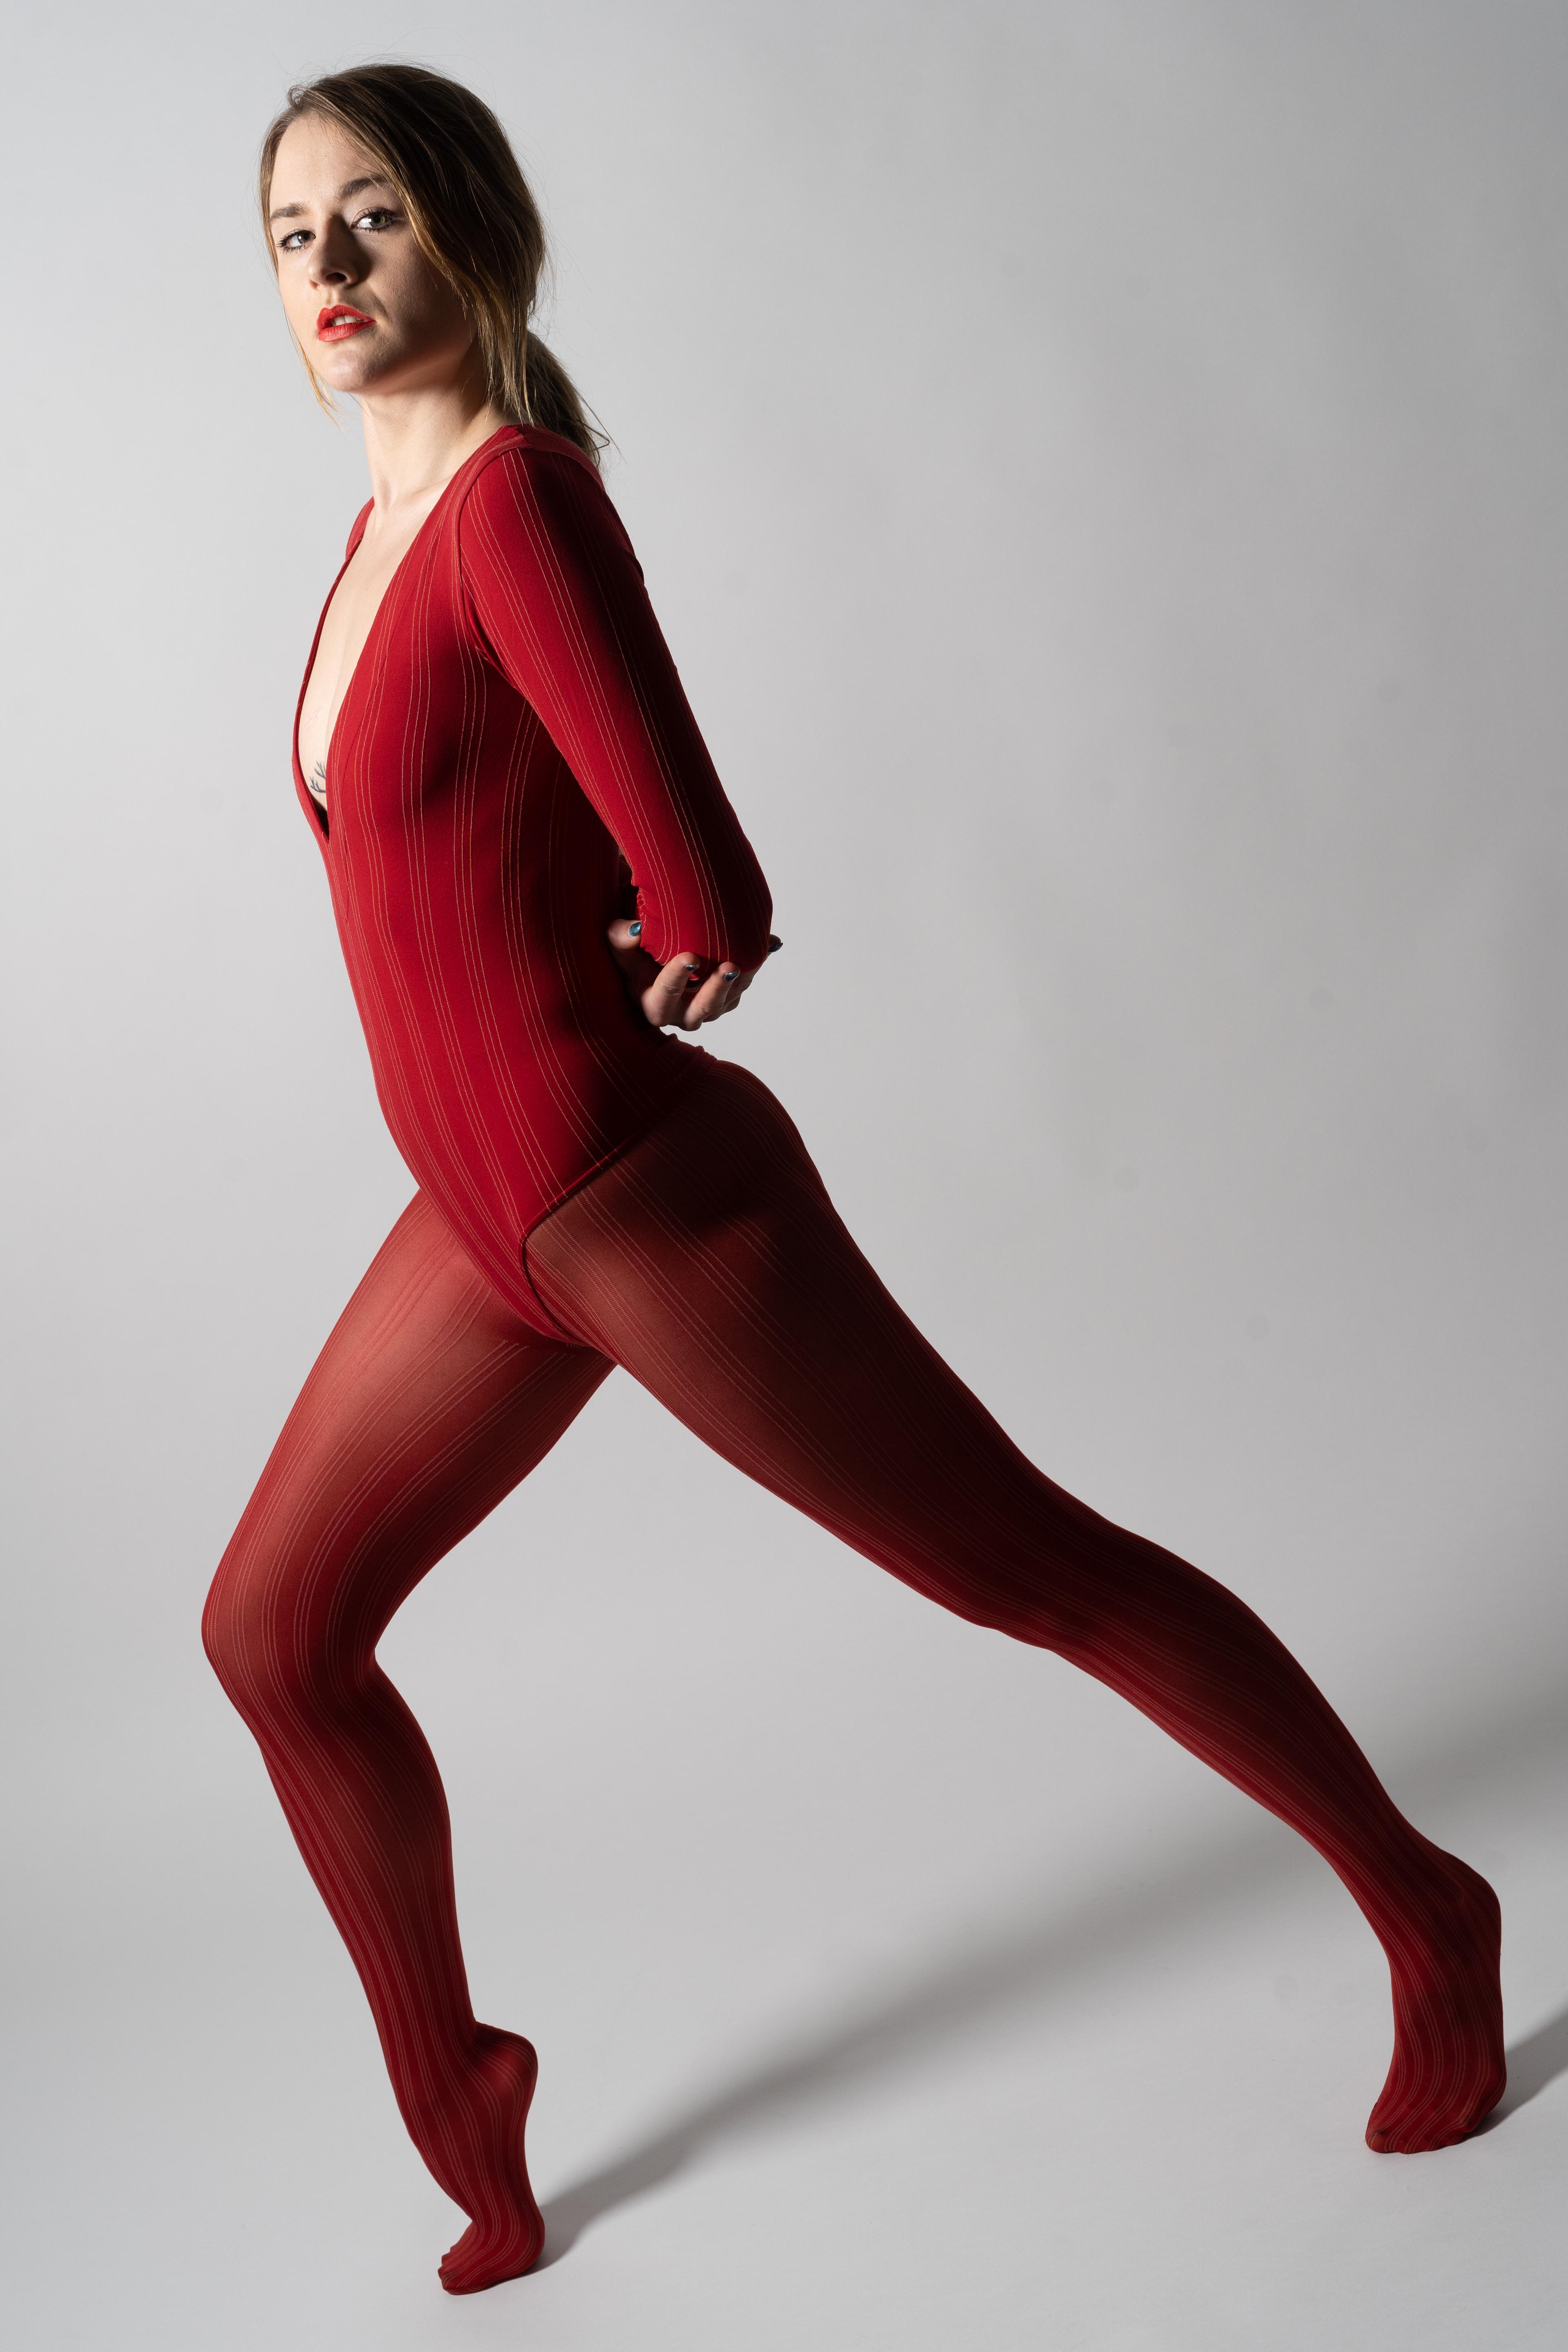 Anastasia voloshina model требования к моделям девушкам